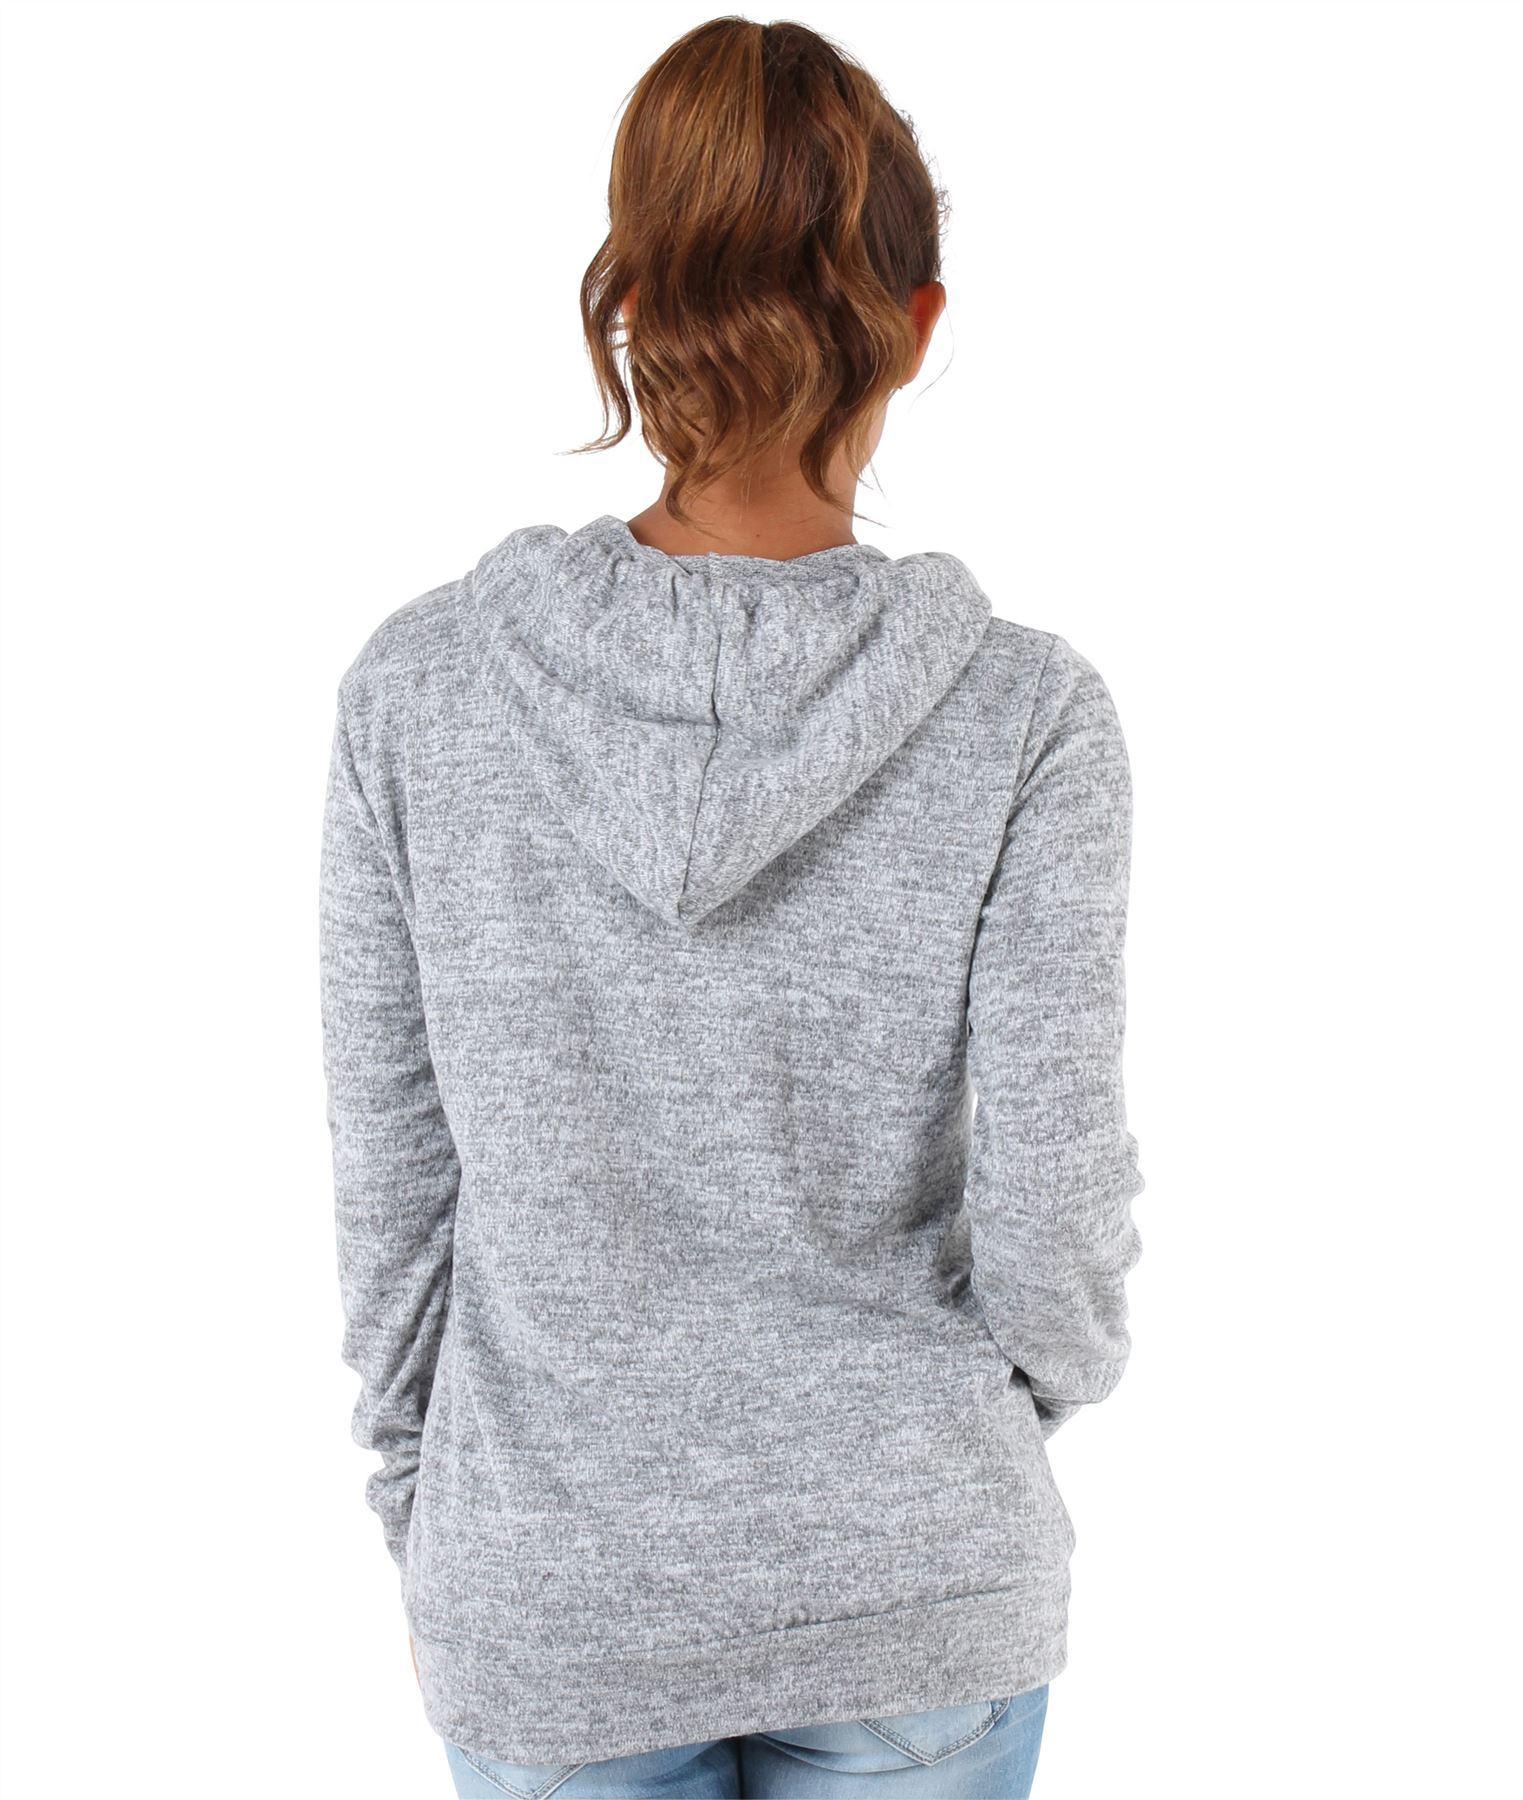 Womens-Soft-Marl-Knit-Hoodie-Hooded-Loose-Baggy-Jumper-Sweater-Top-Sweatshirt thumbnail 9